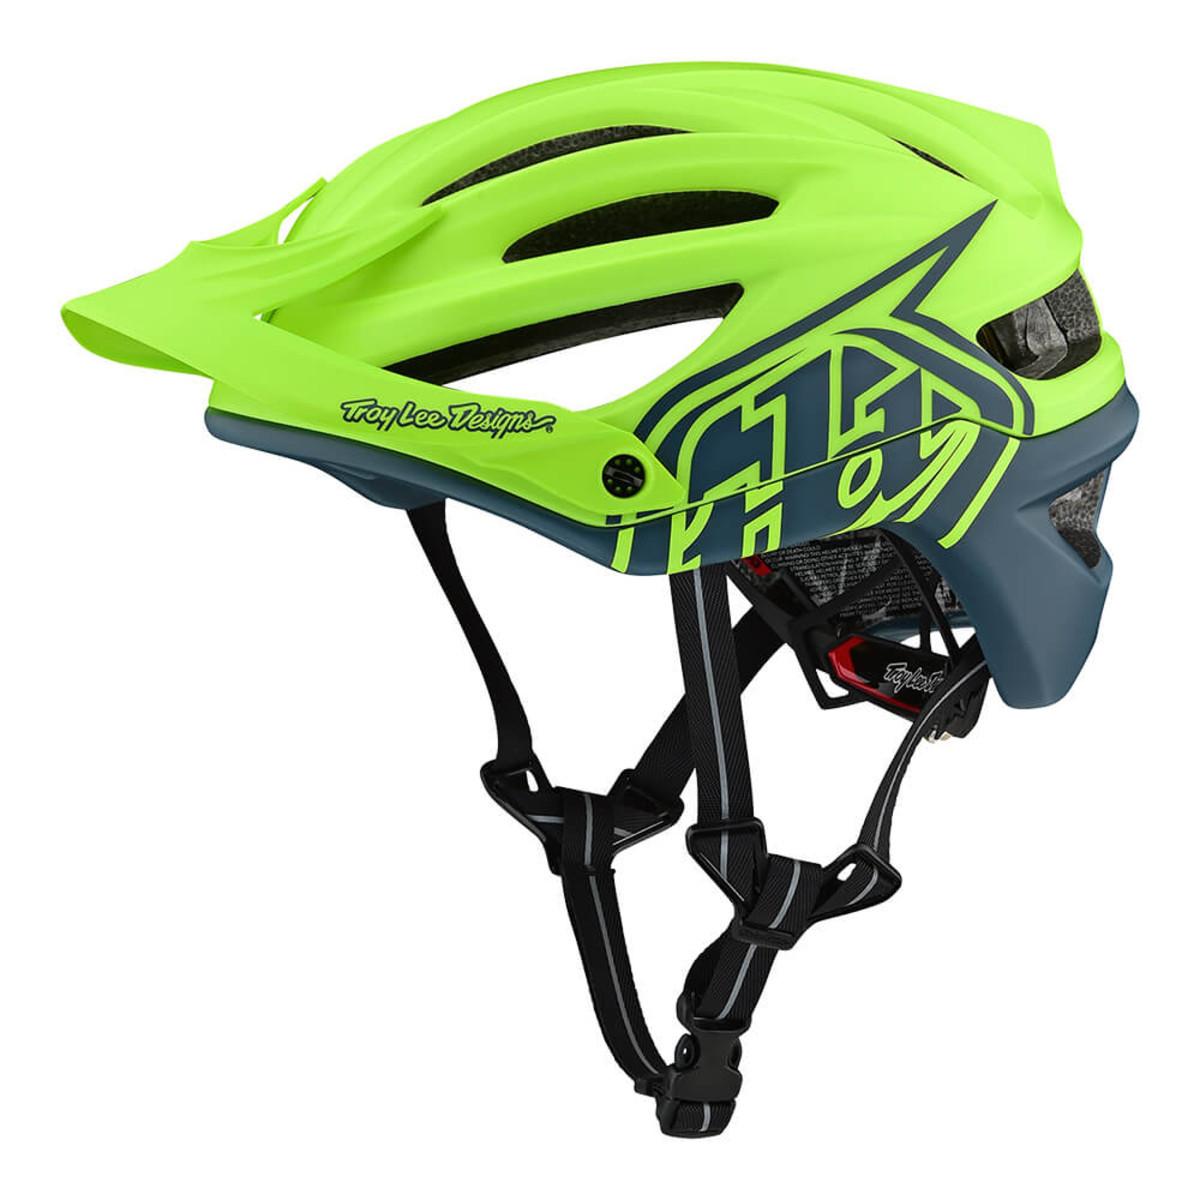 Вело шлем TLD A2 Mips Decoy [Flo Yellow / AIR Force Blue] размер S